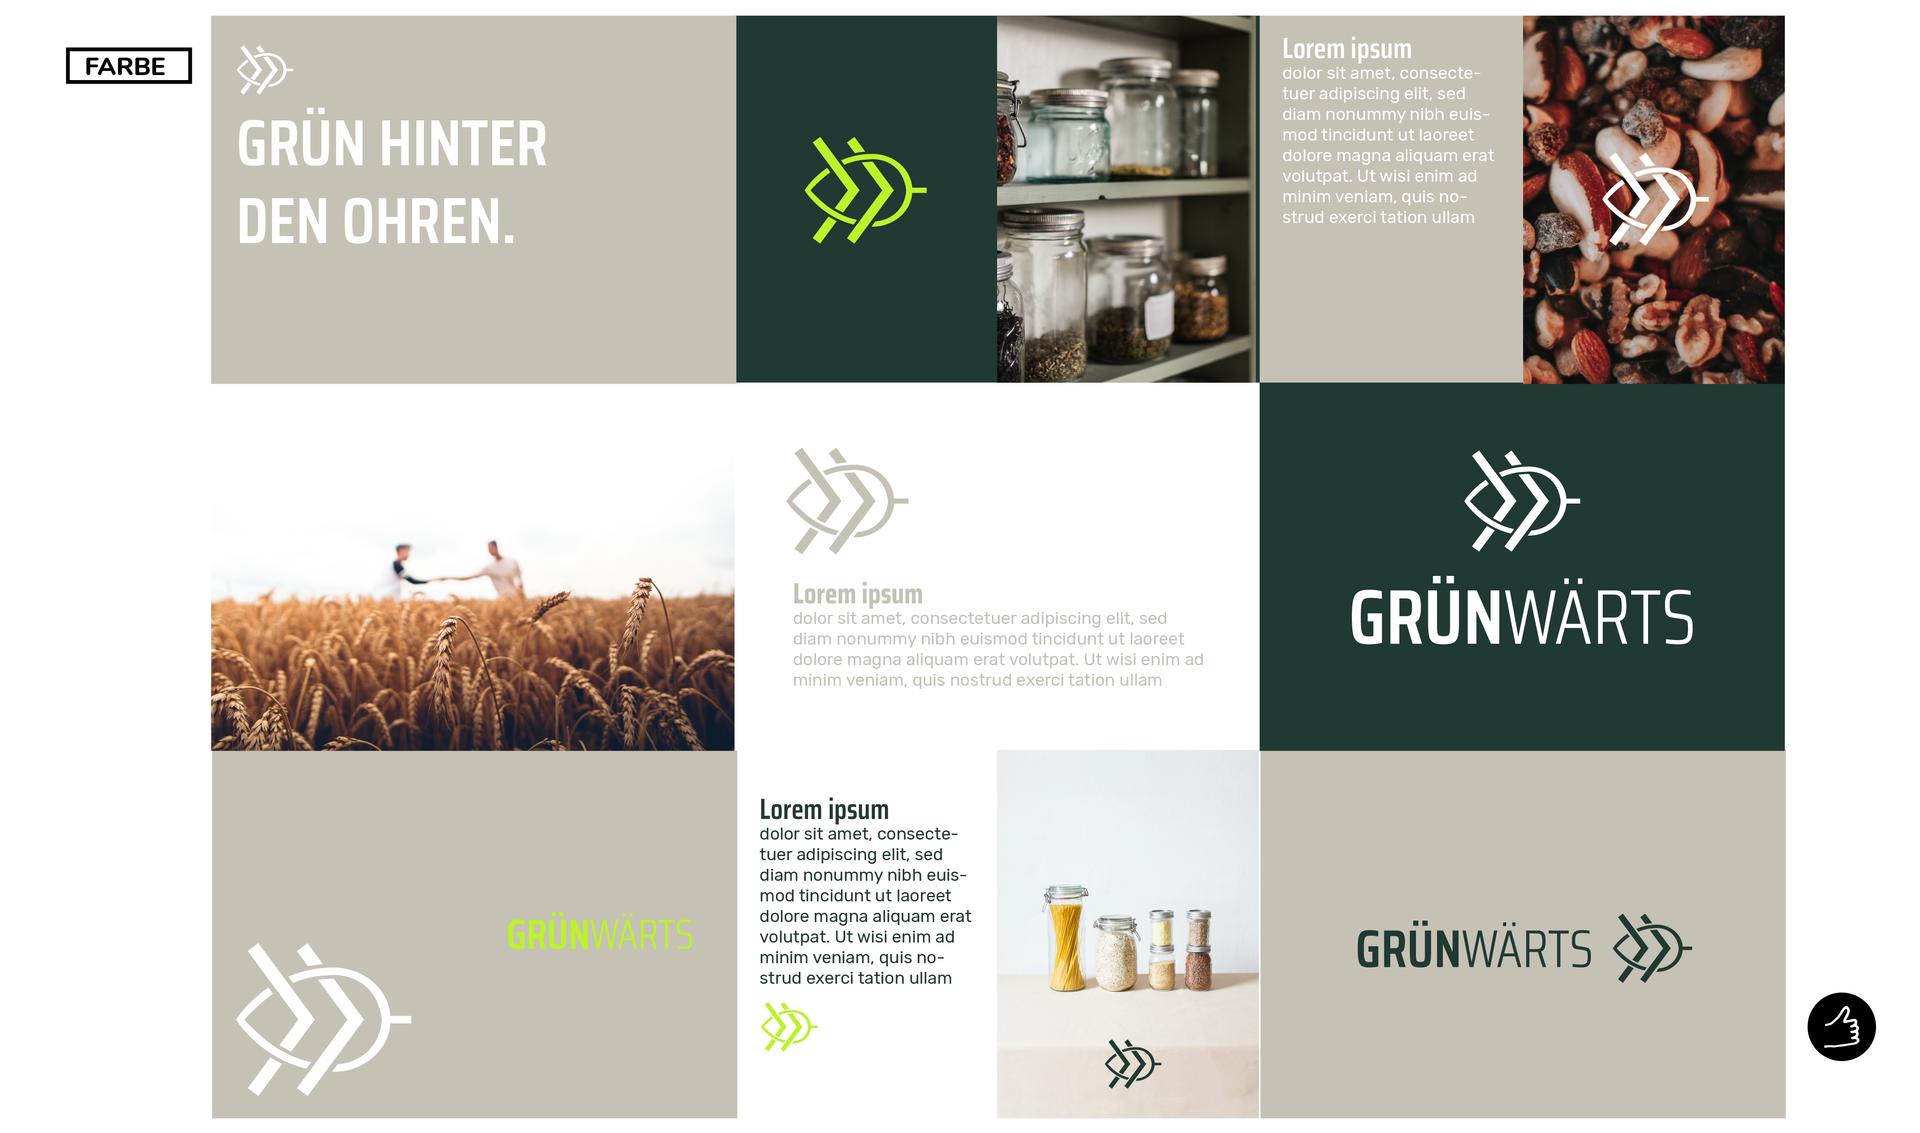 gruenwaerts(2)-Farbe4.png